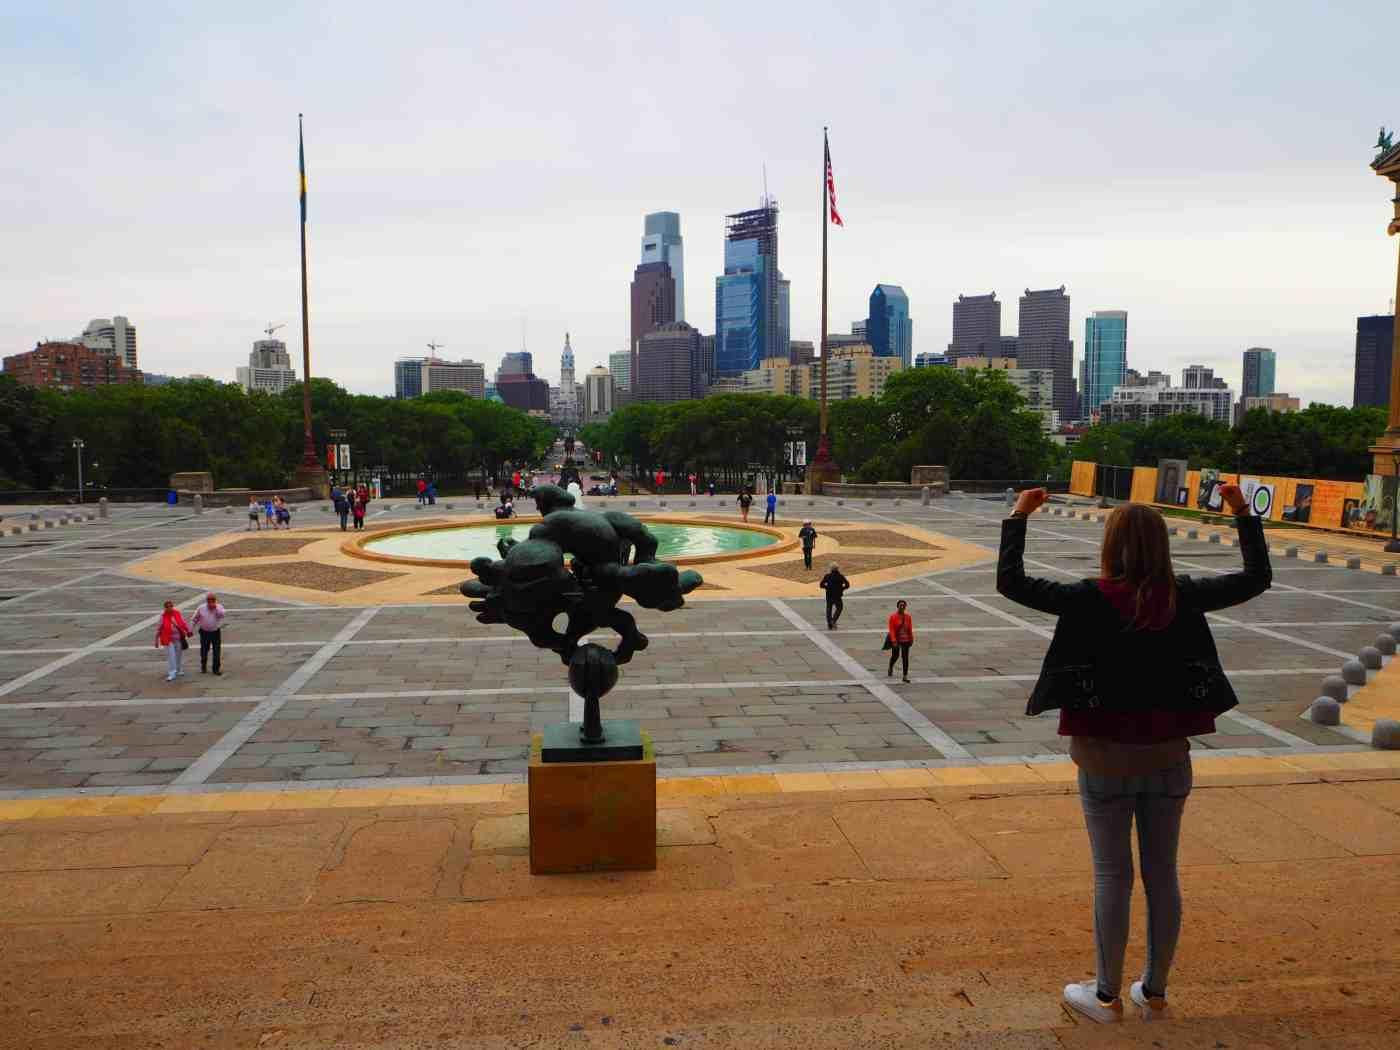 Rocky steps Philly